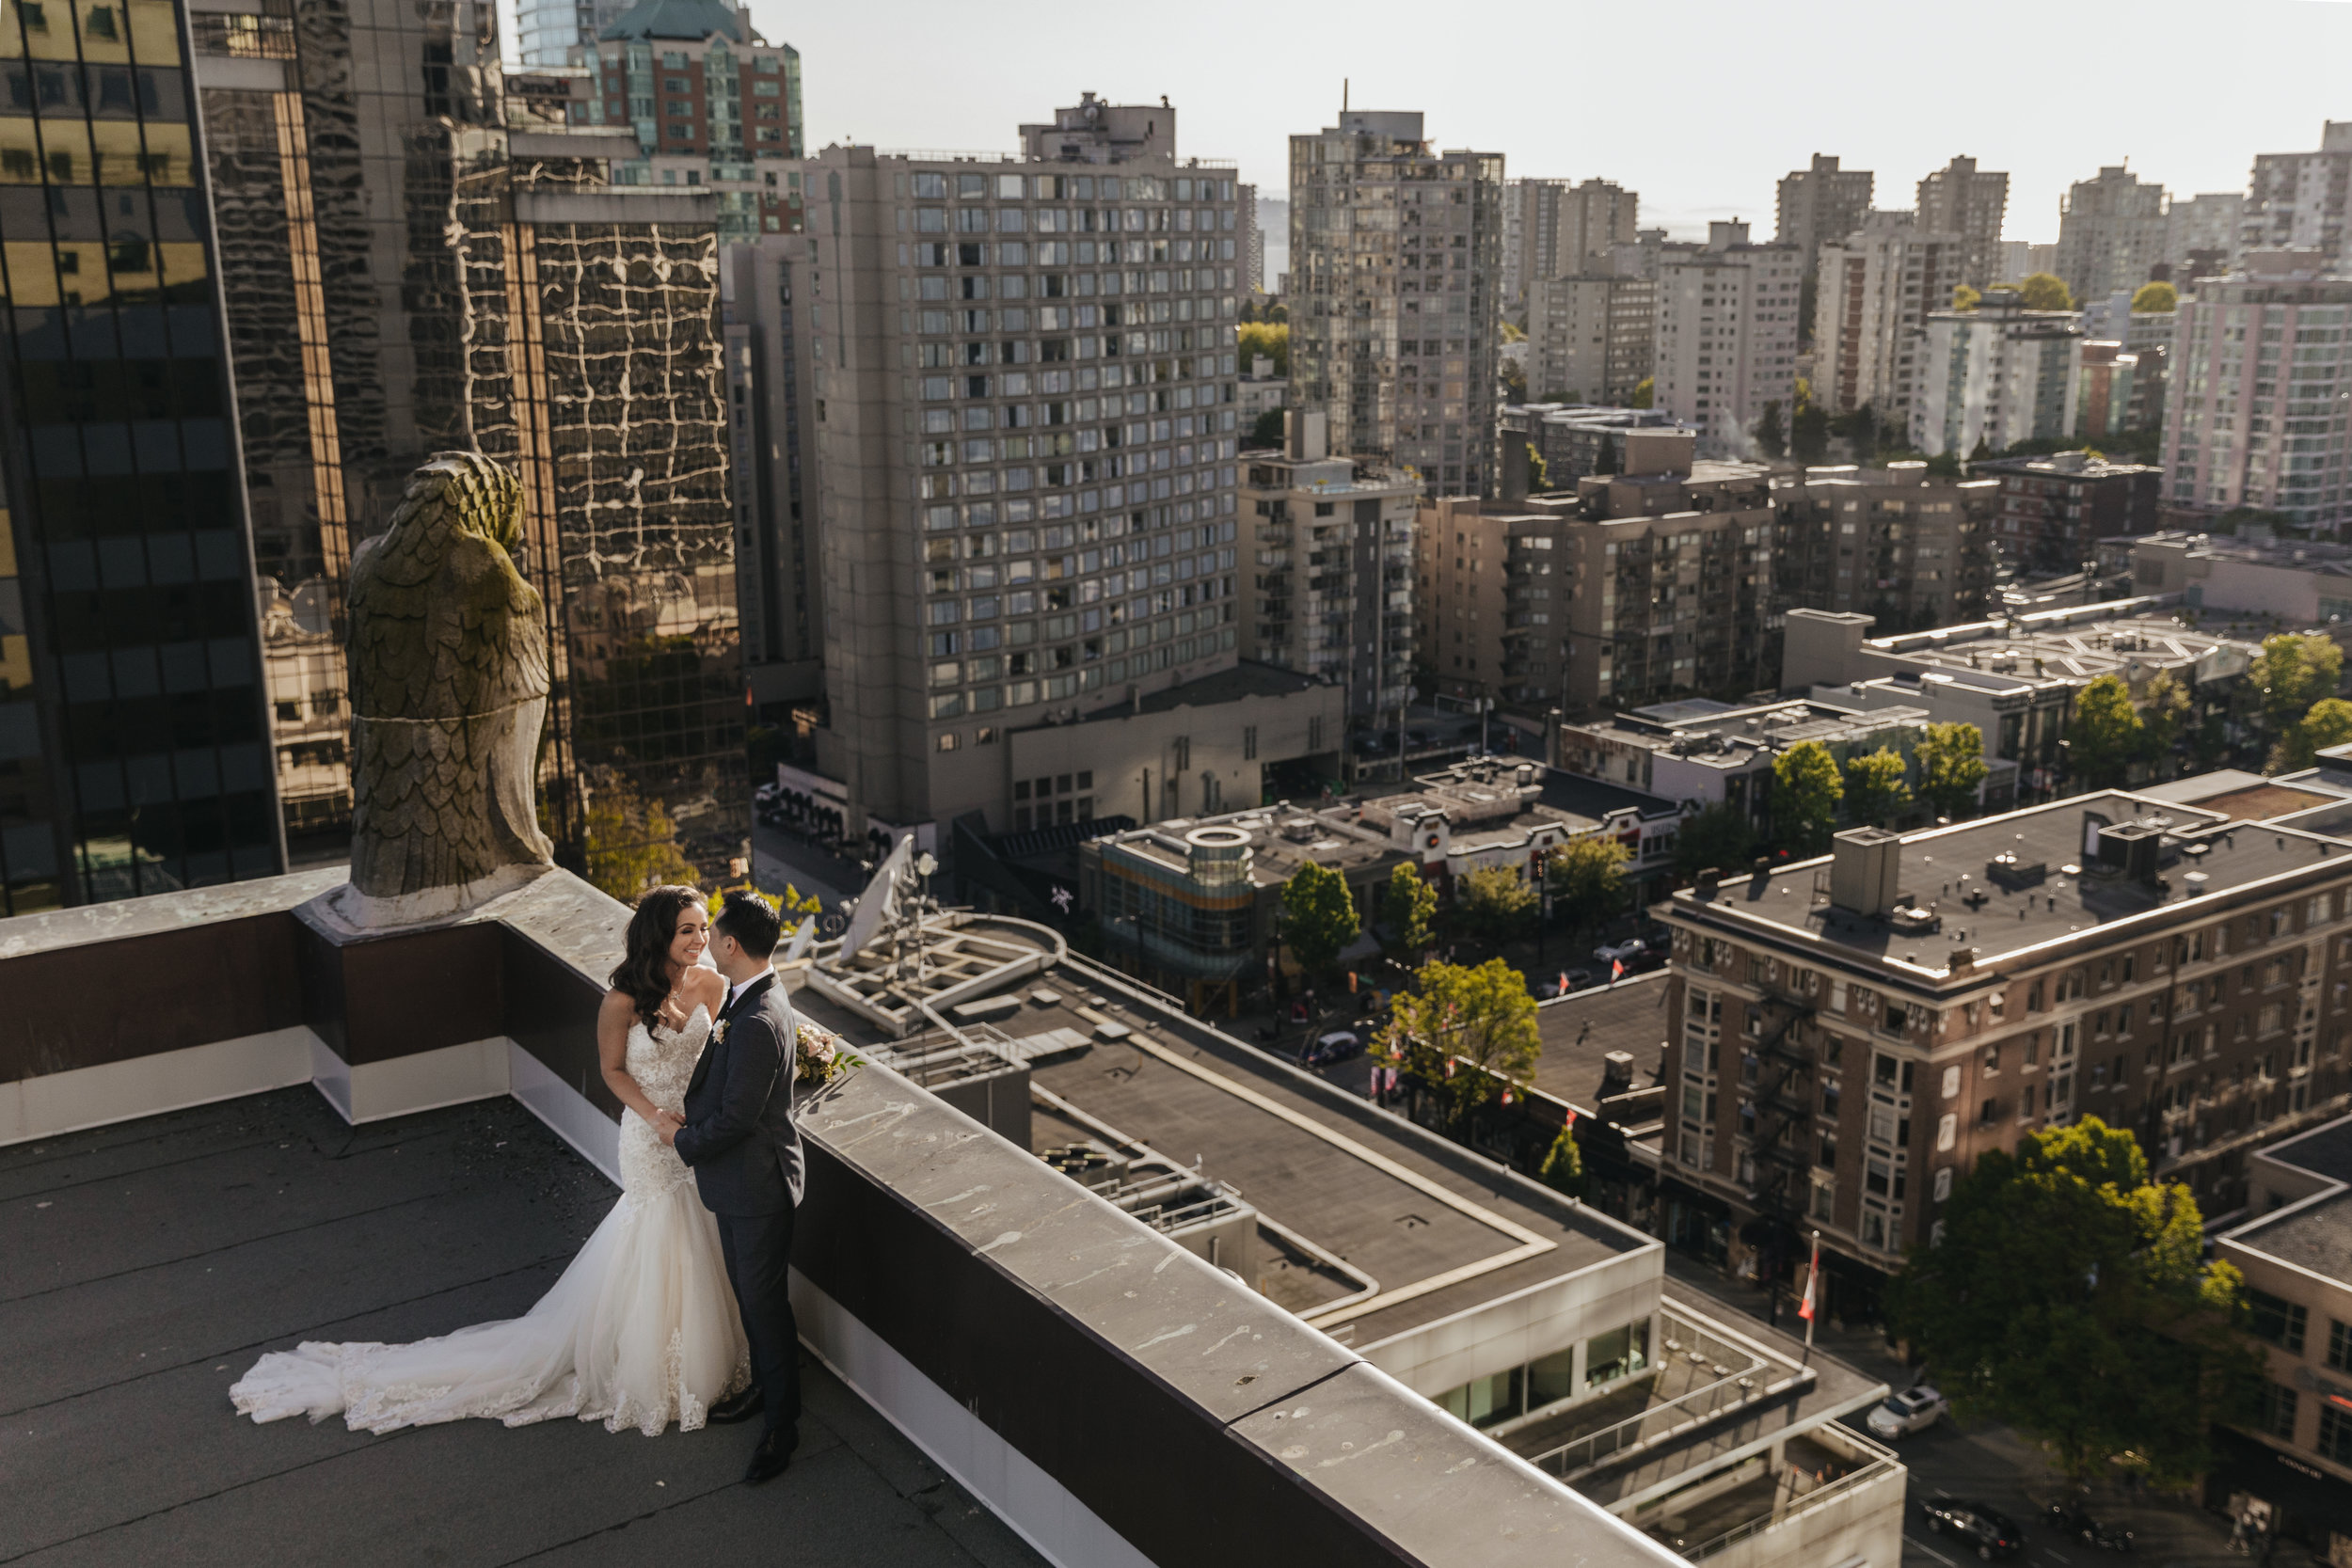 HeraStudios_FatemahVictor_Wedding_SelectsFull-56.jpg